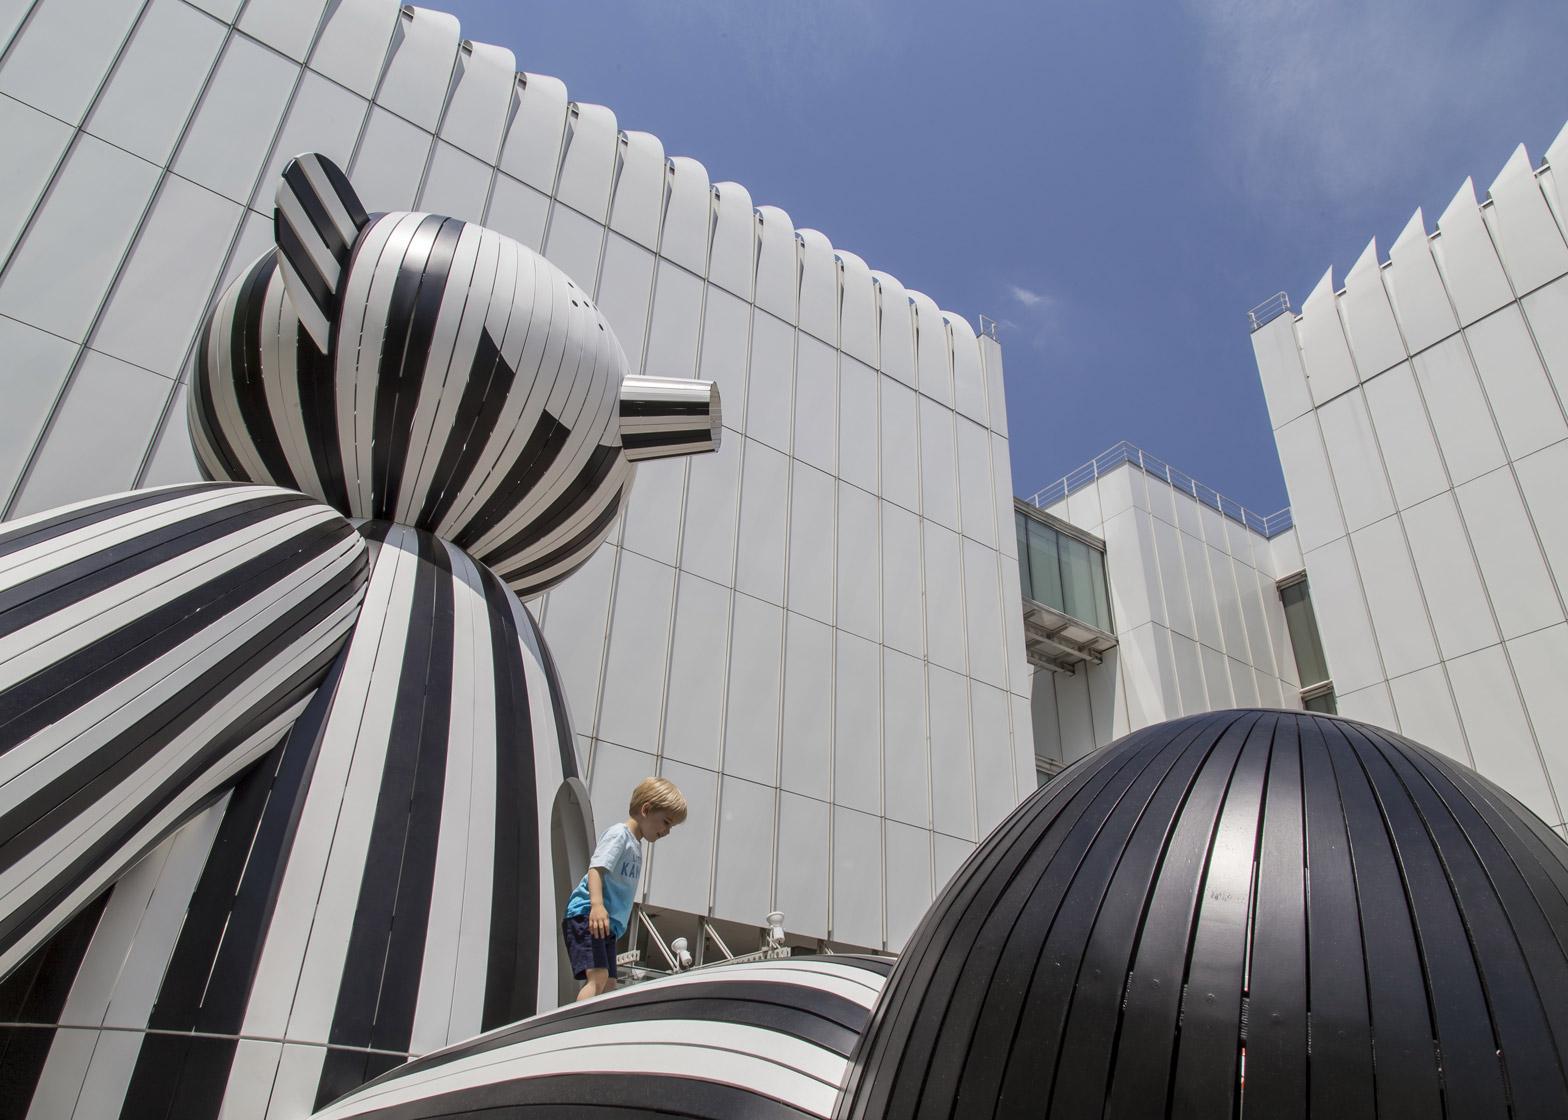 Tiovivo: whimsical sculptiures exhibition by Jaimé Hayon at the High Museum of Art in Atlanta